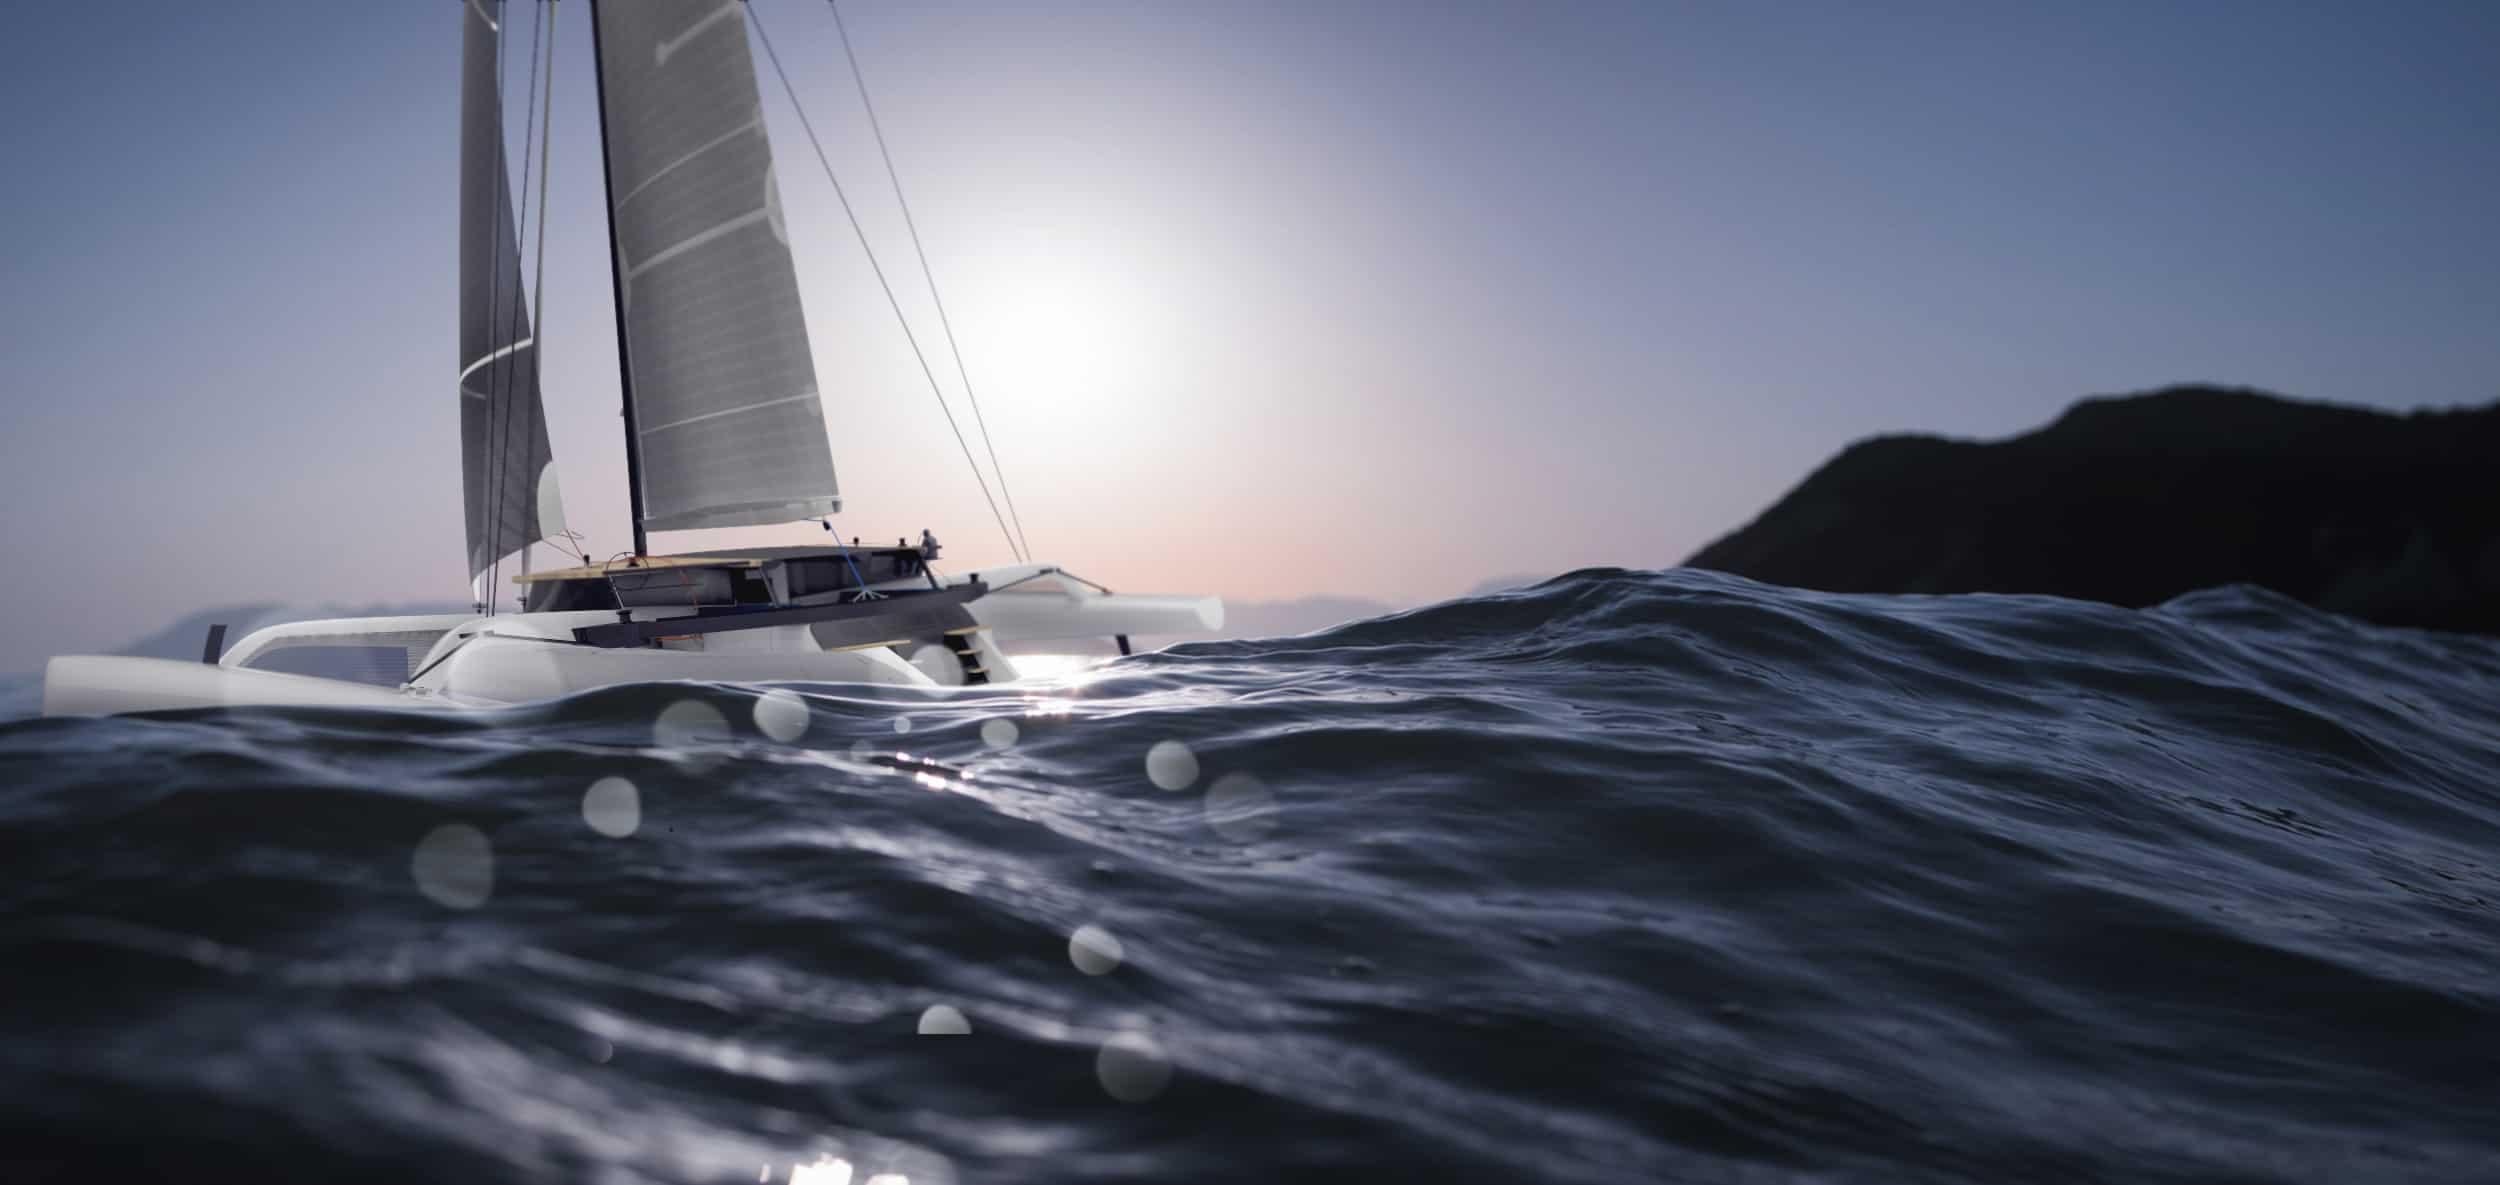 Yacht Trimaran by Alibi Yachts - Design Ideas